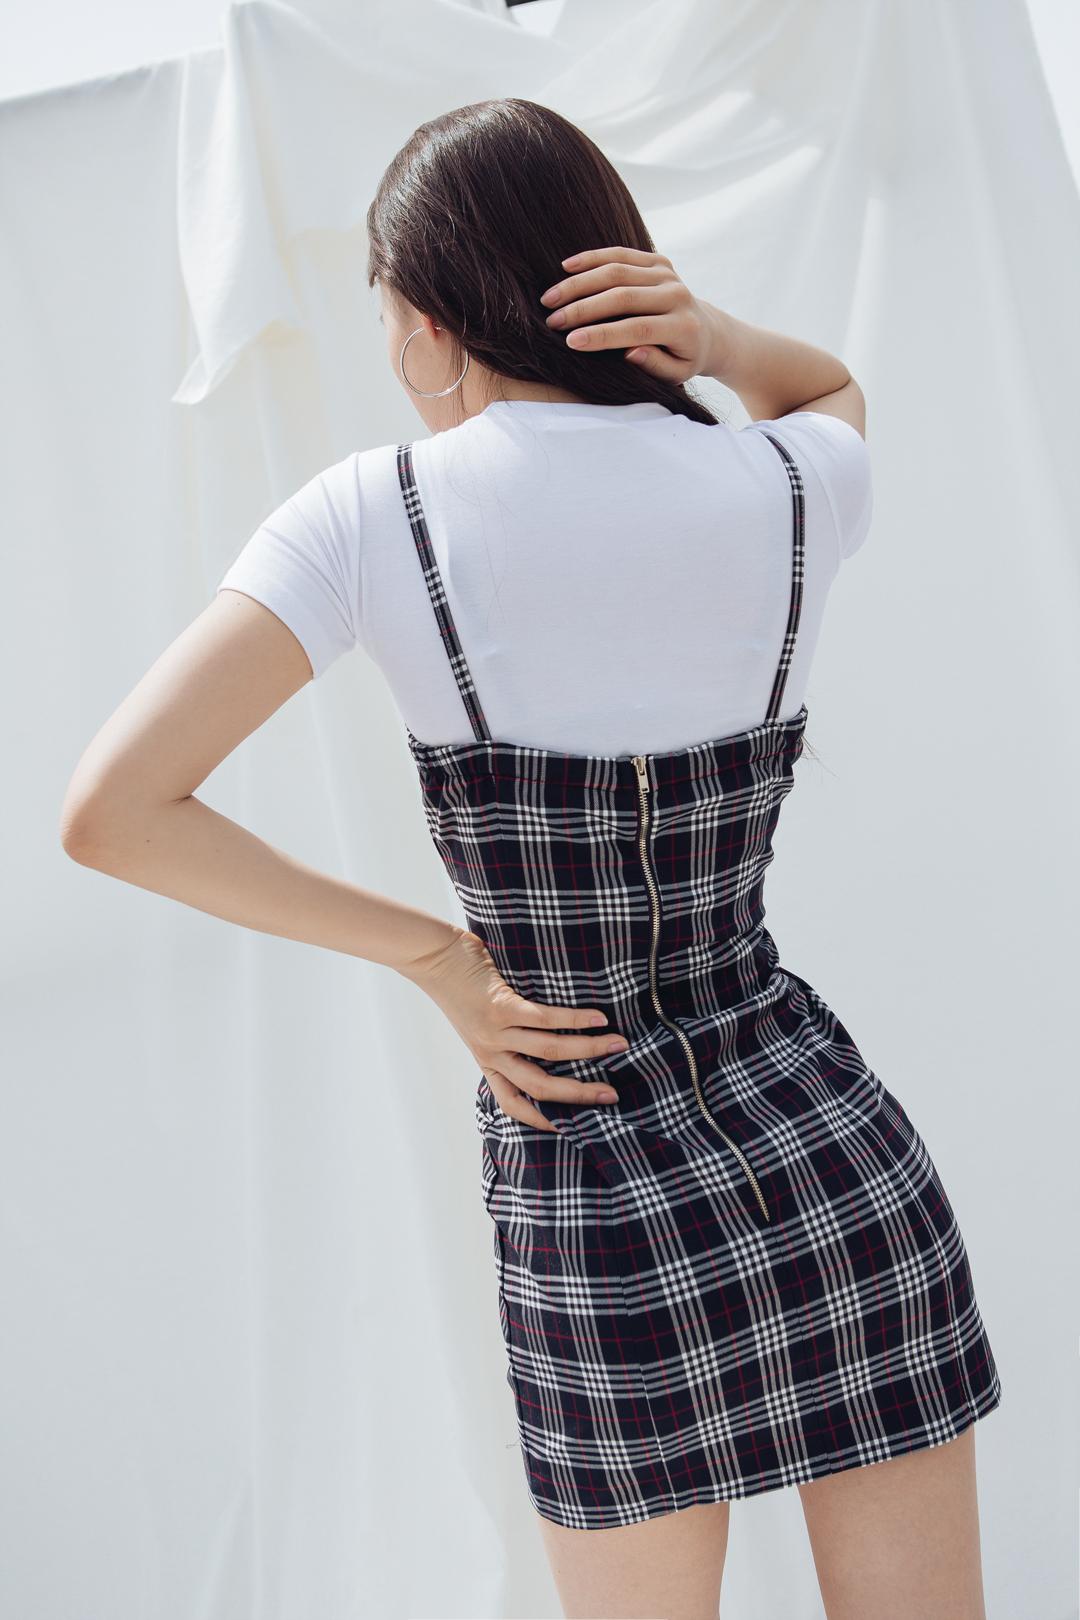 Coco Sleeveless Dress